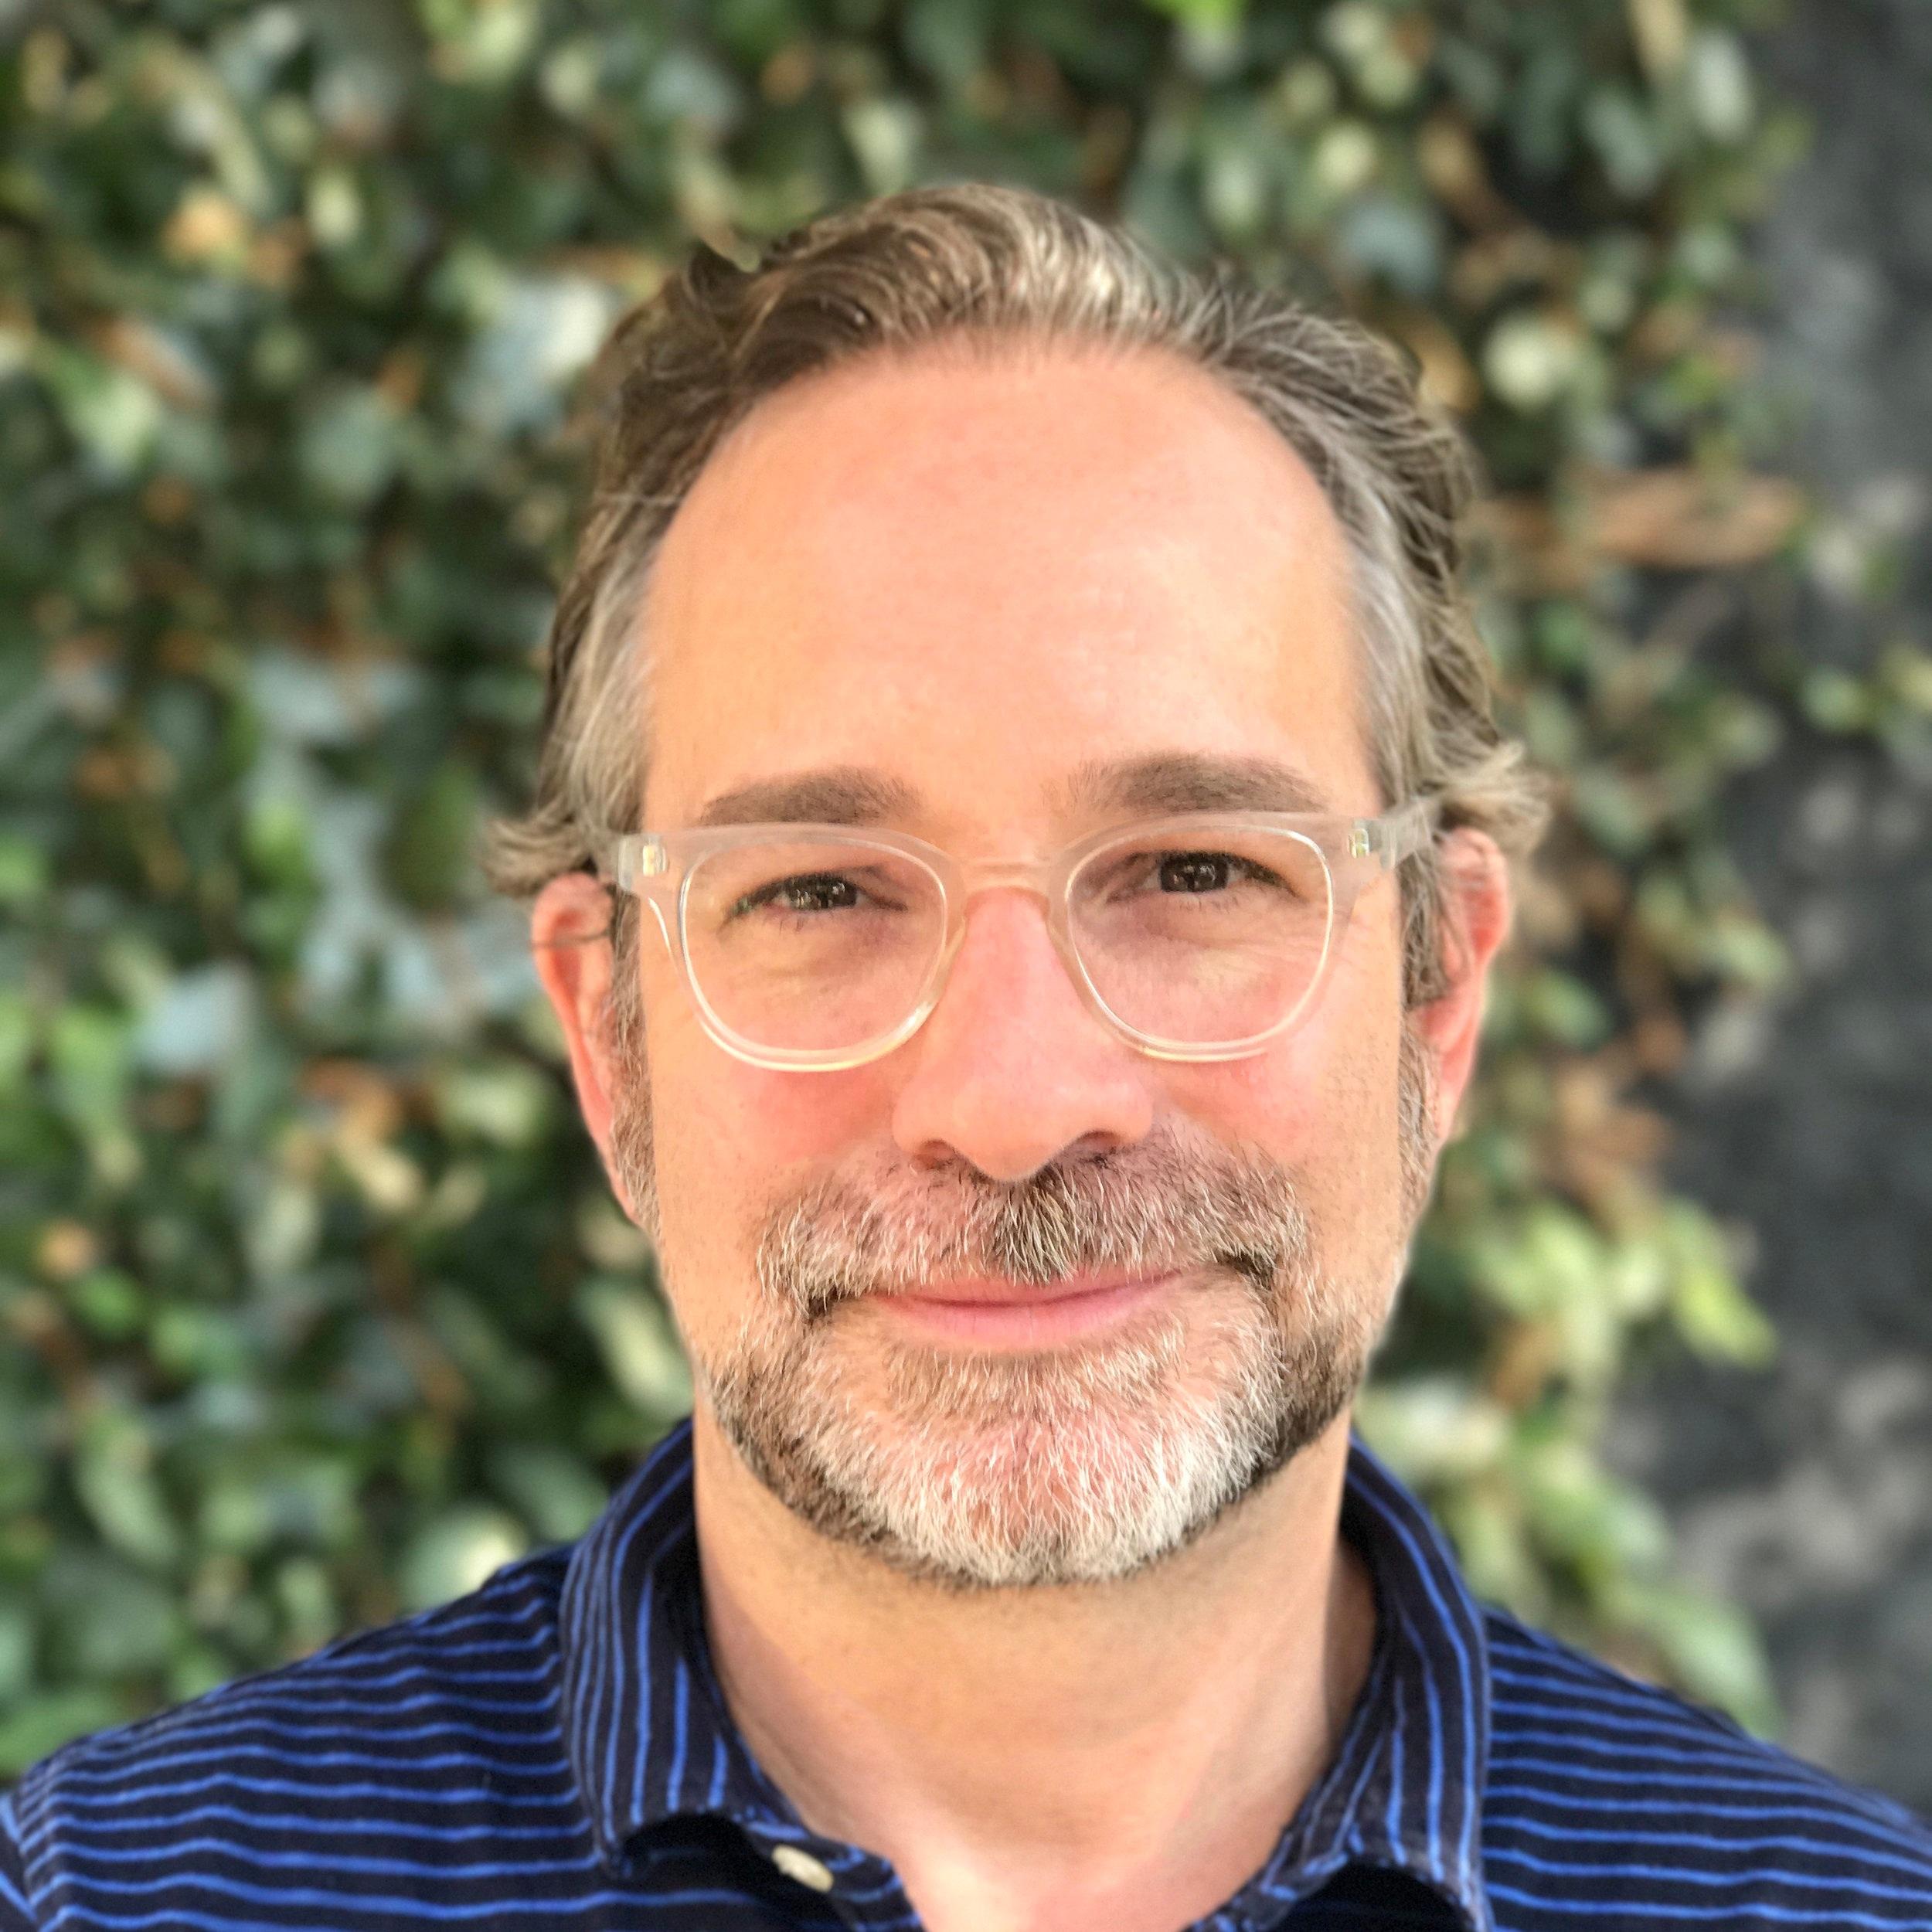 Colin Mangham - Founder & Managing Director